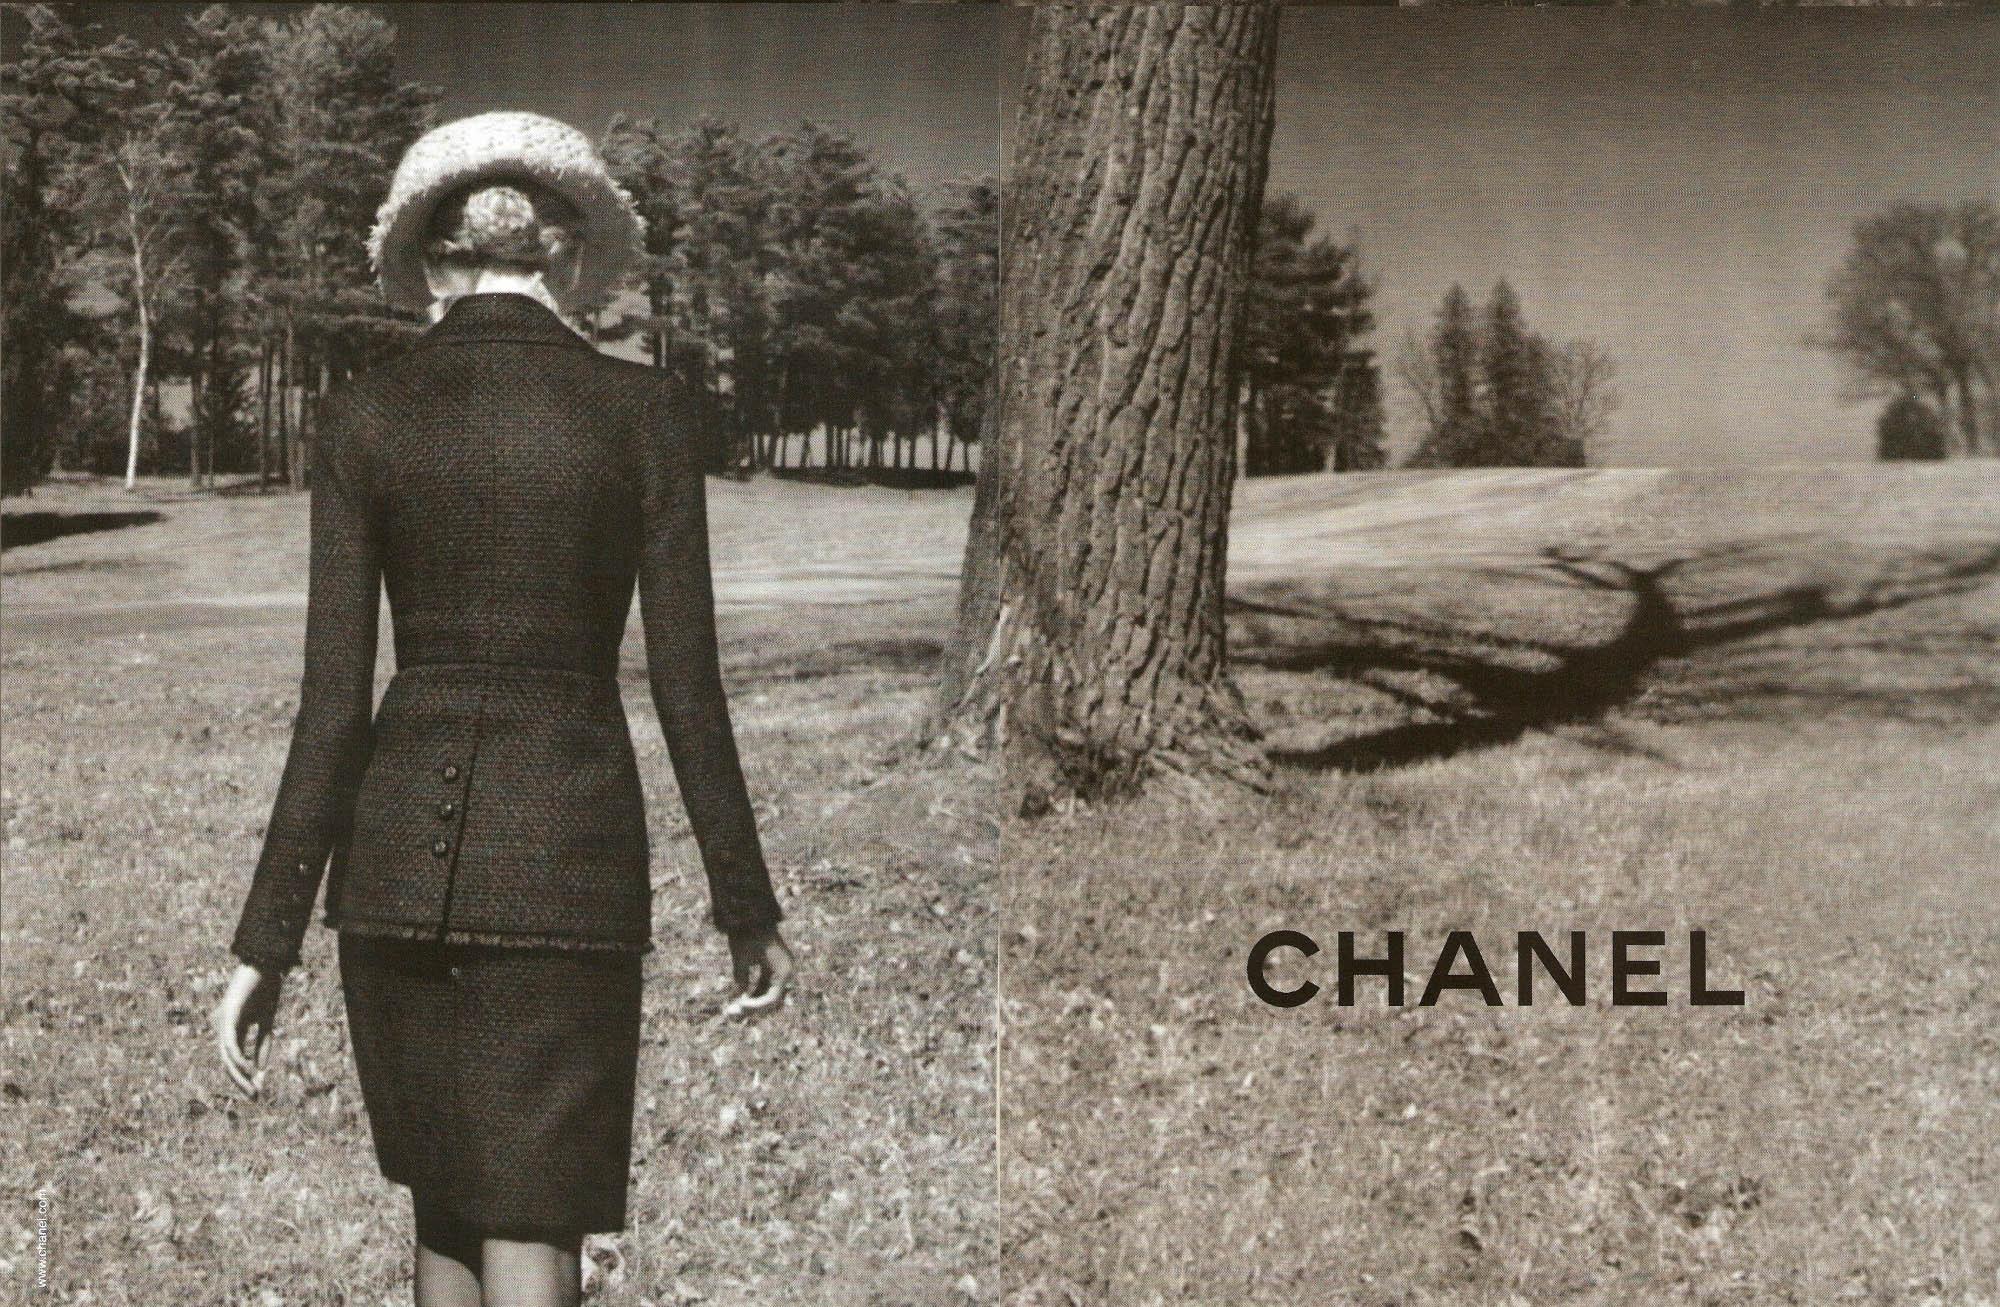 Chanel Wallpaper 2000x1307